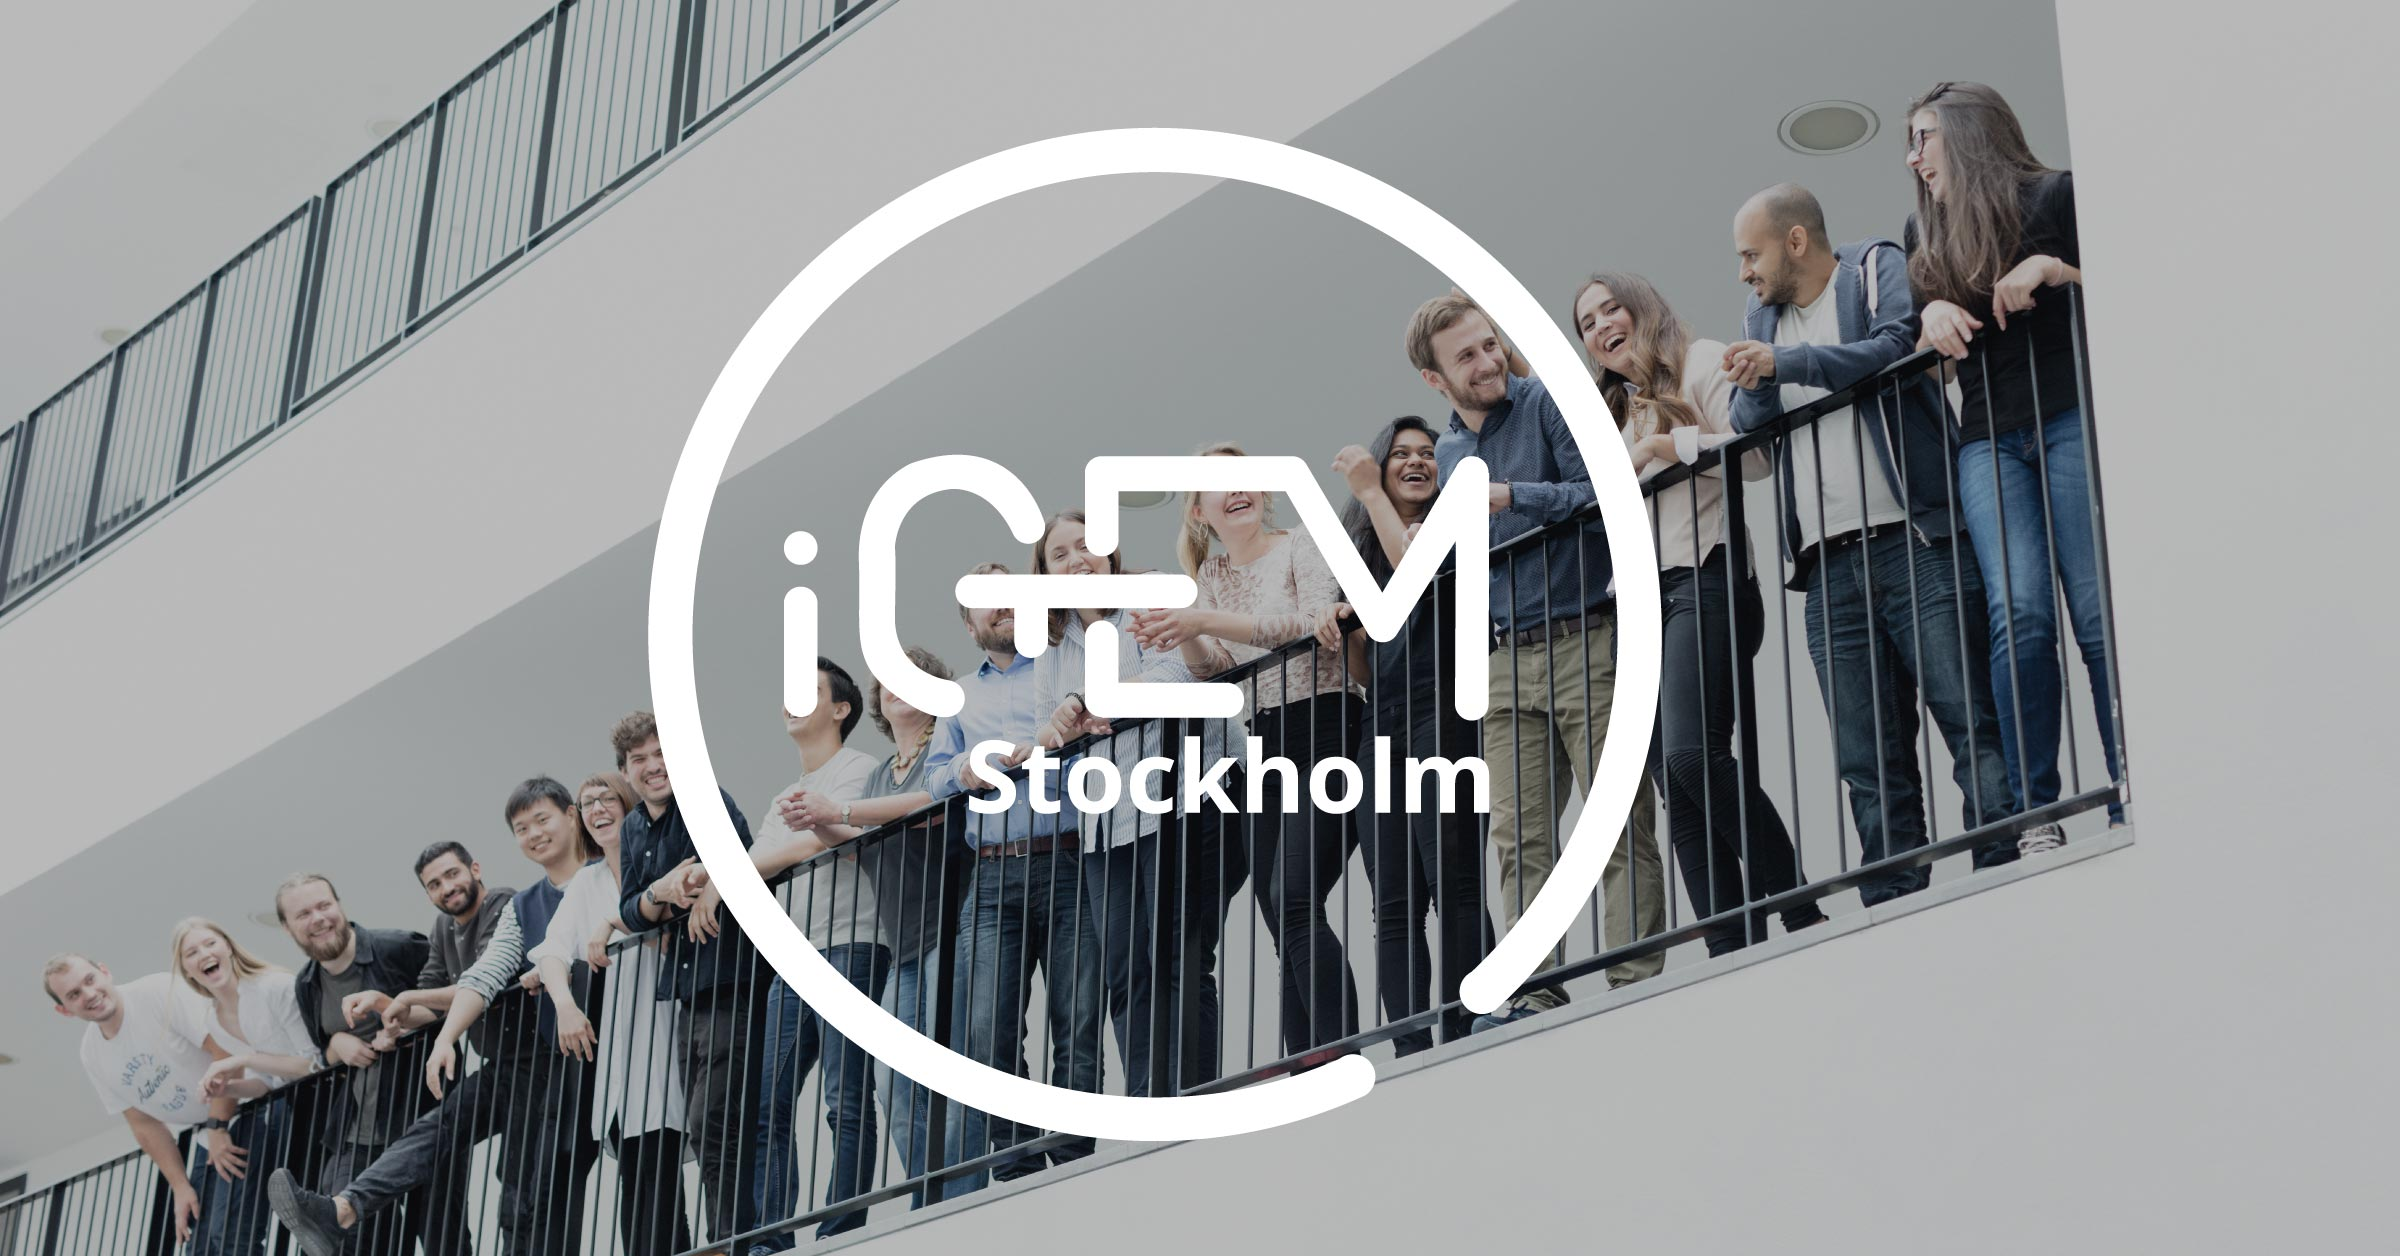 igem_stockholm_hero